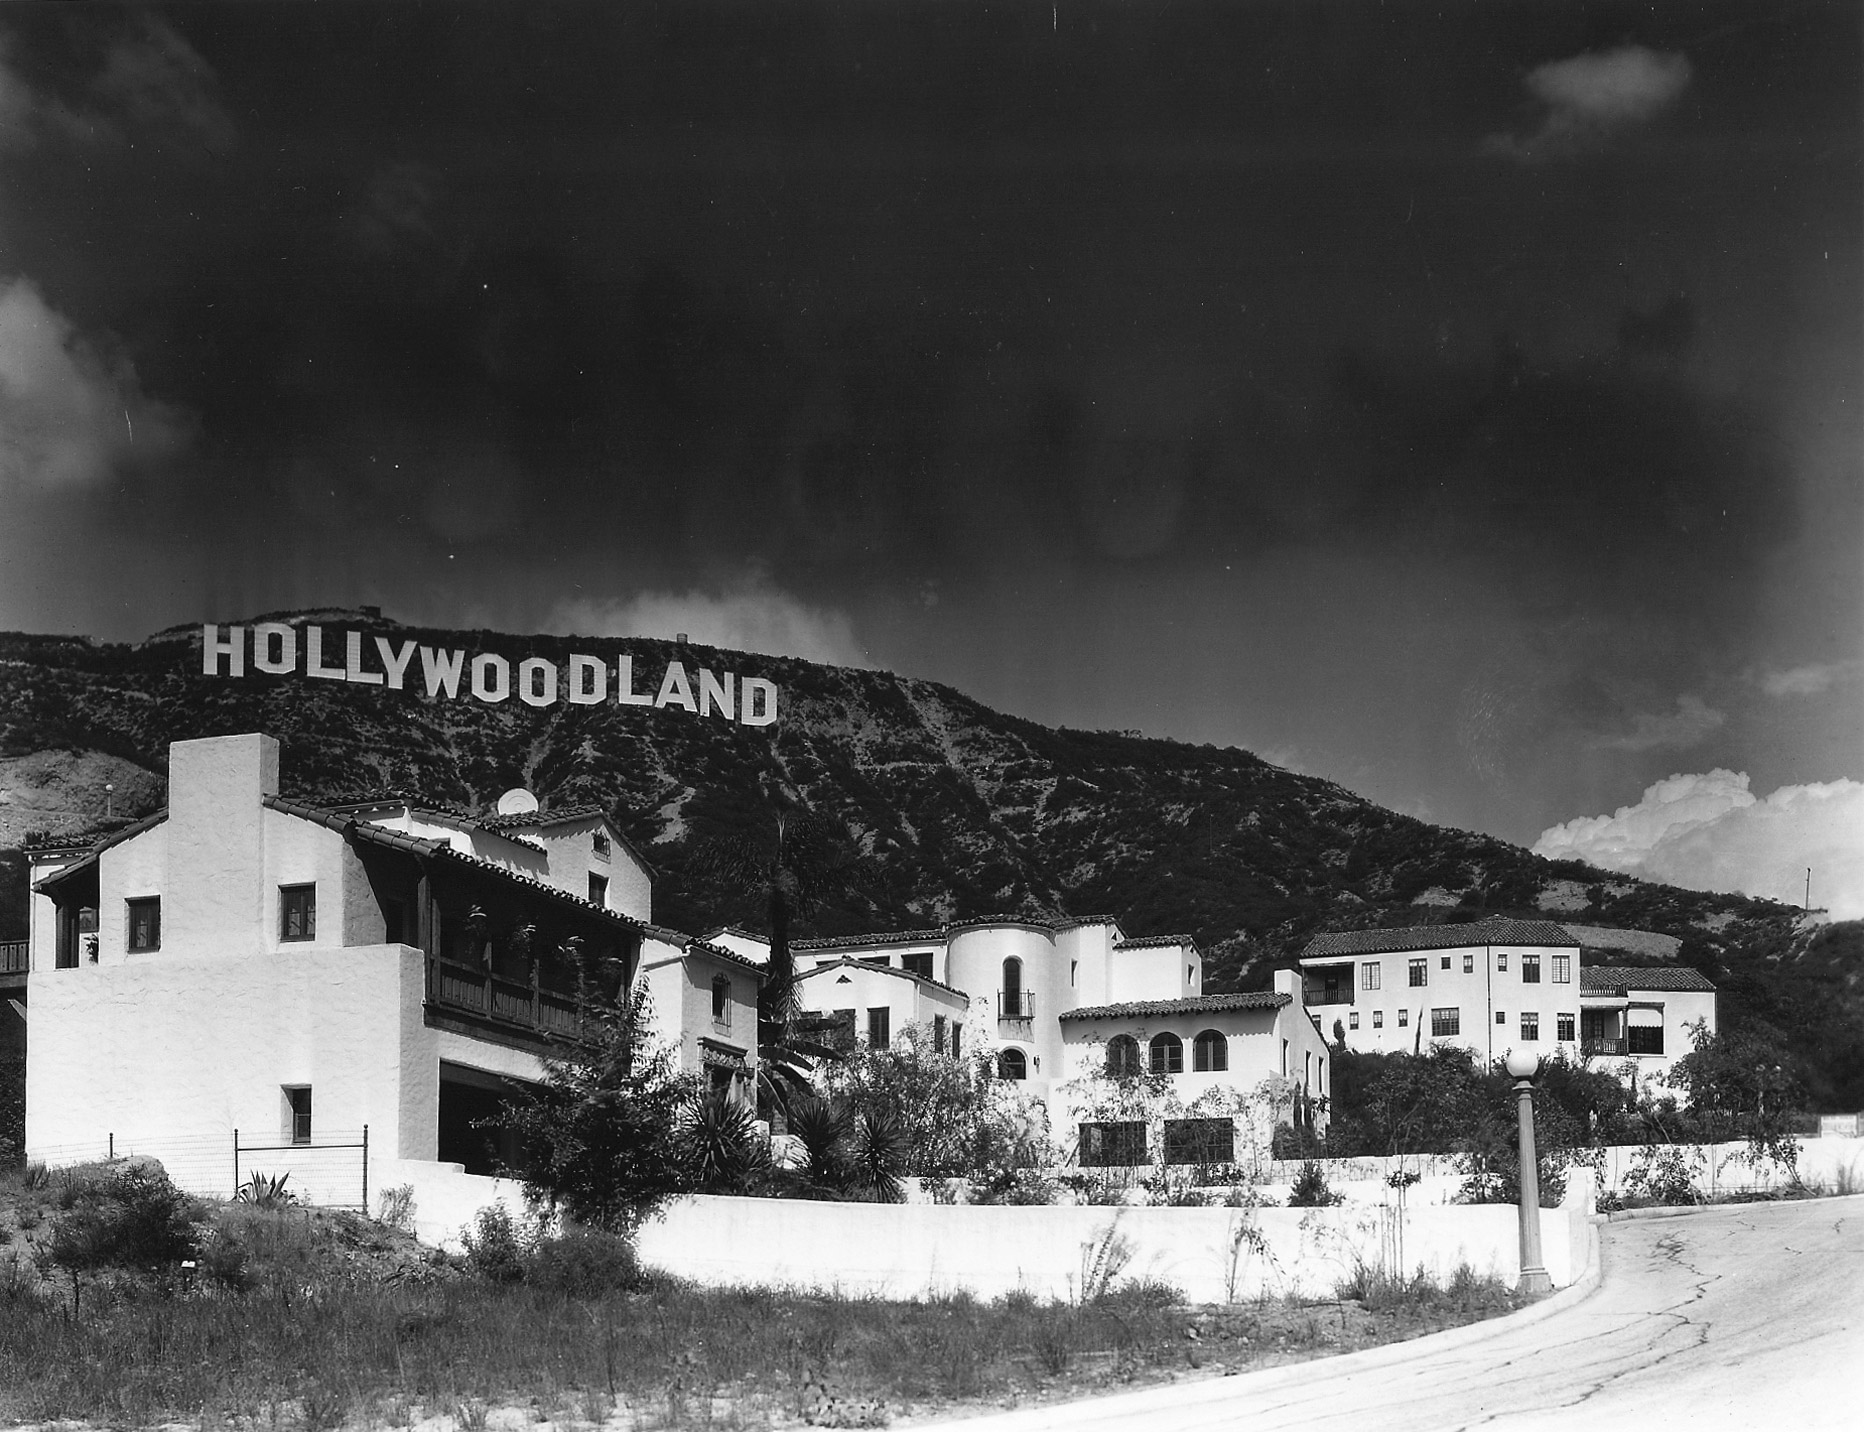 Brand new Hollywoodland homes, 1925.